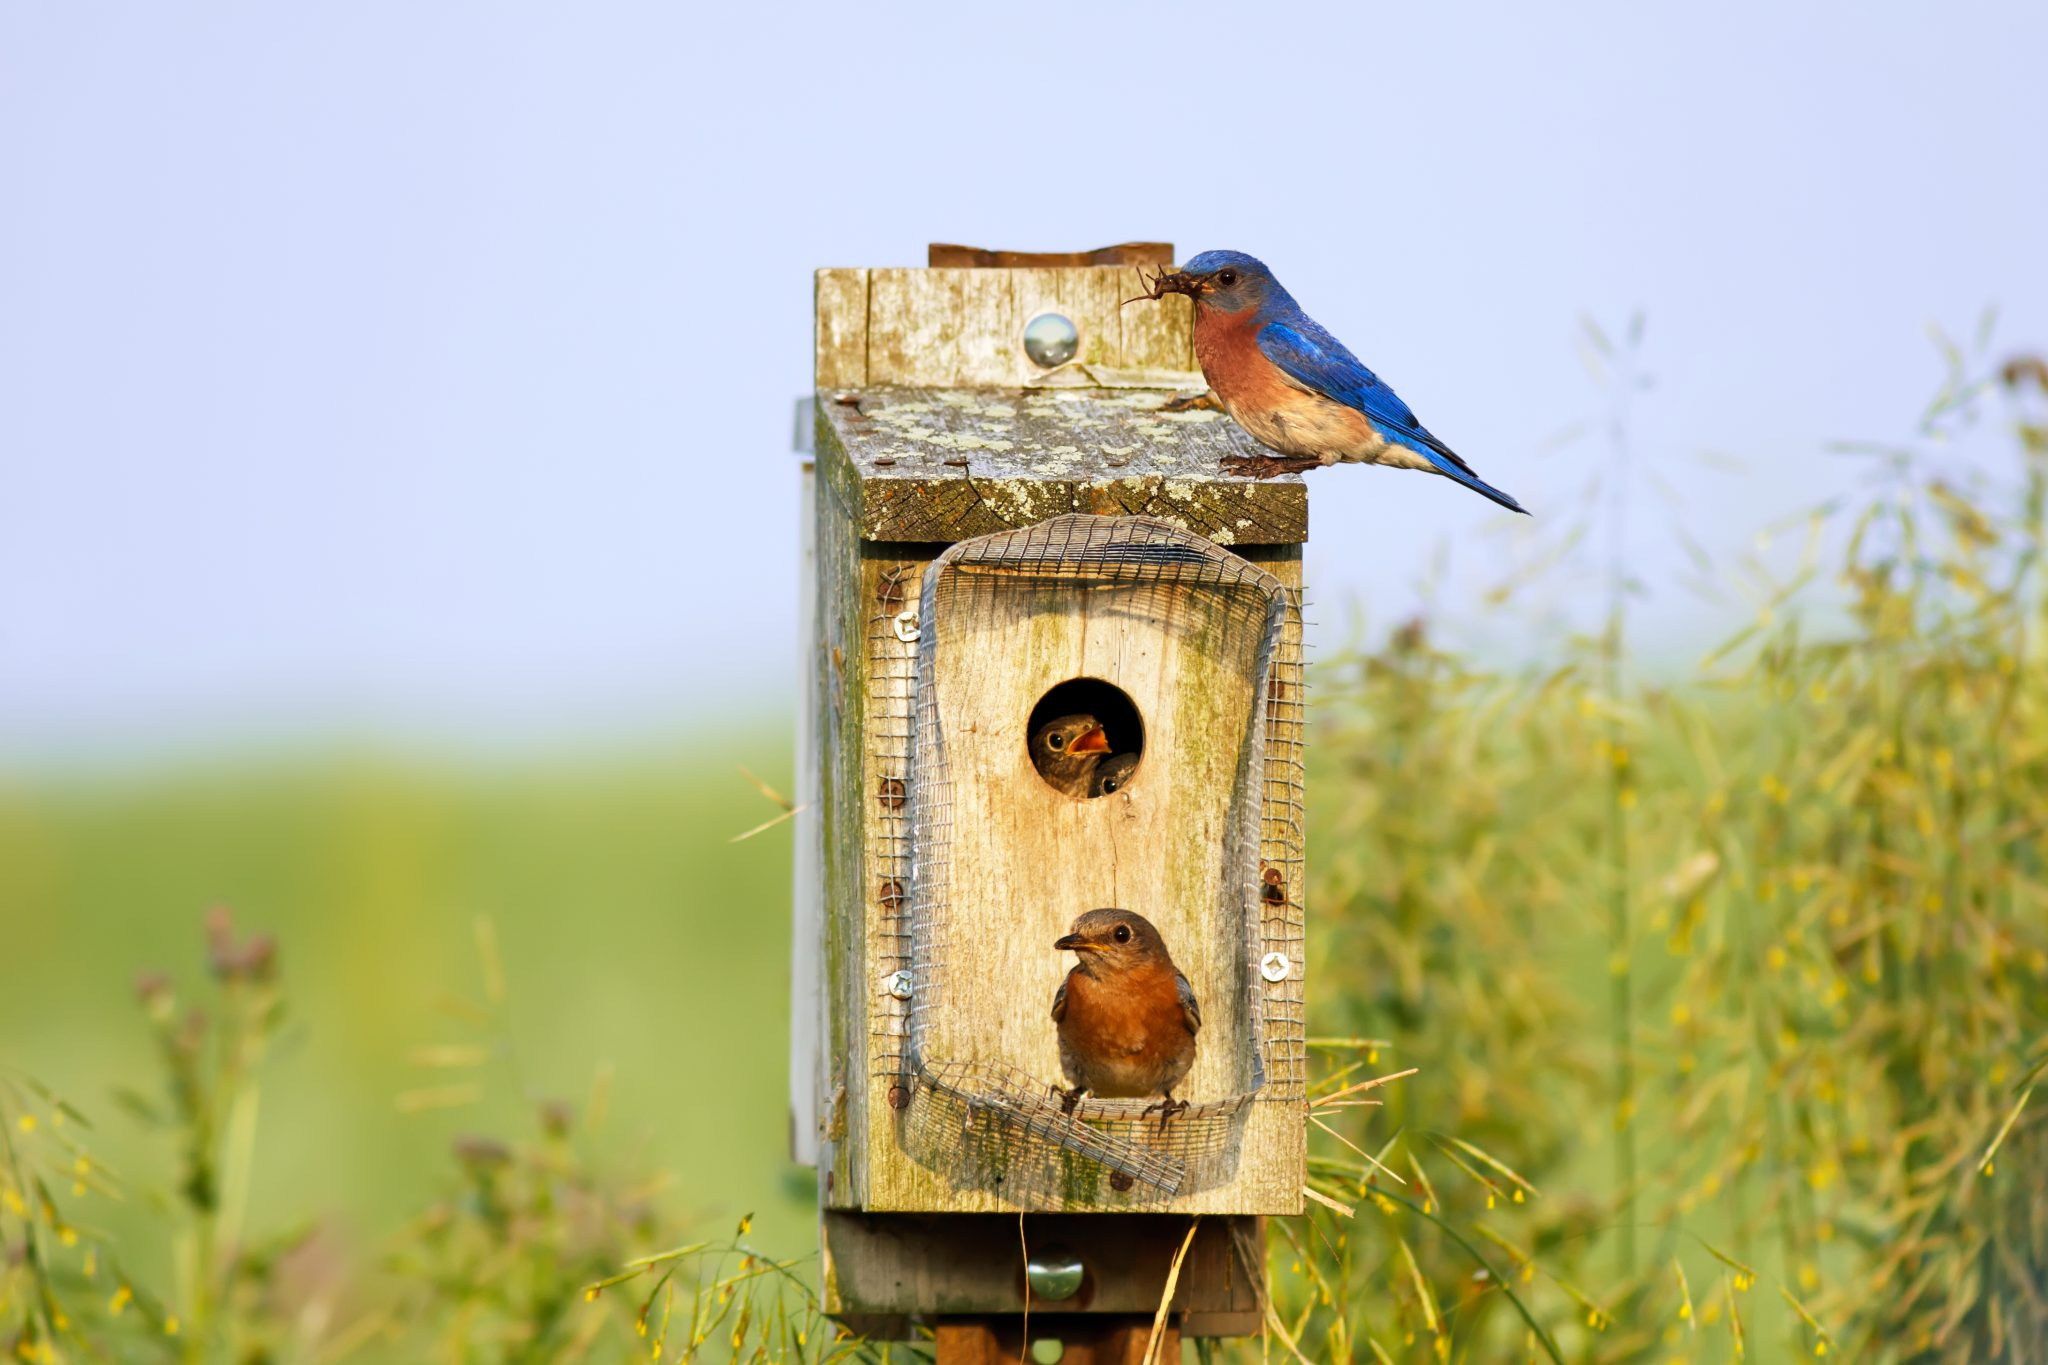 Male and female bluebirds around a birdhouse.